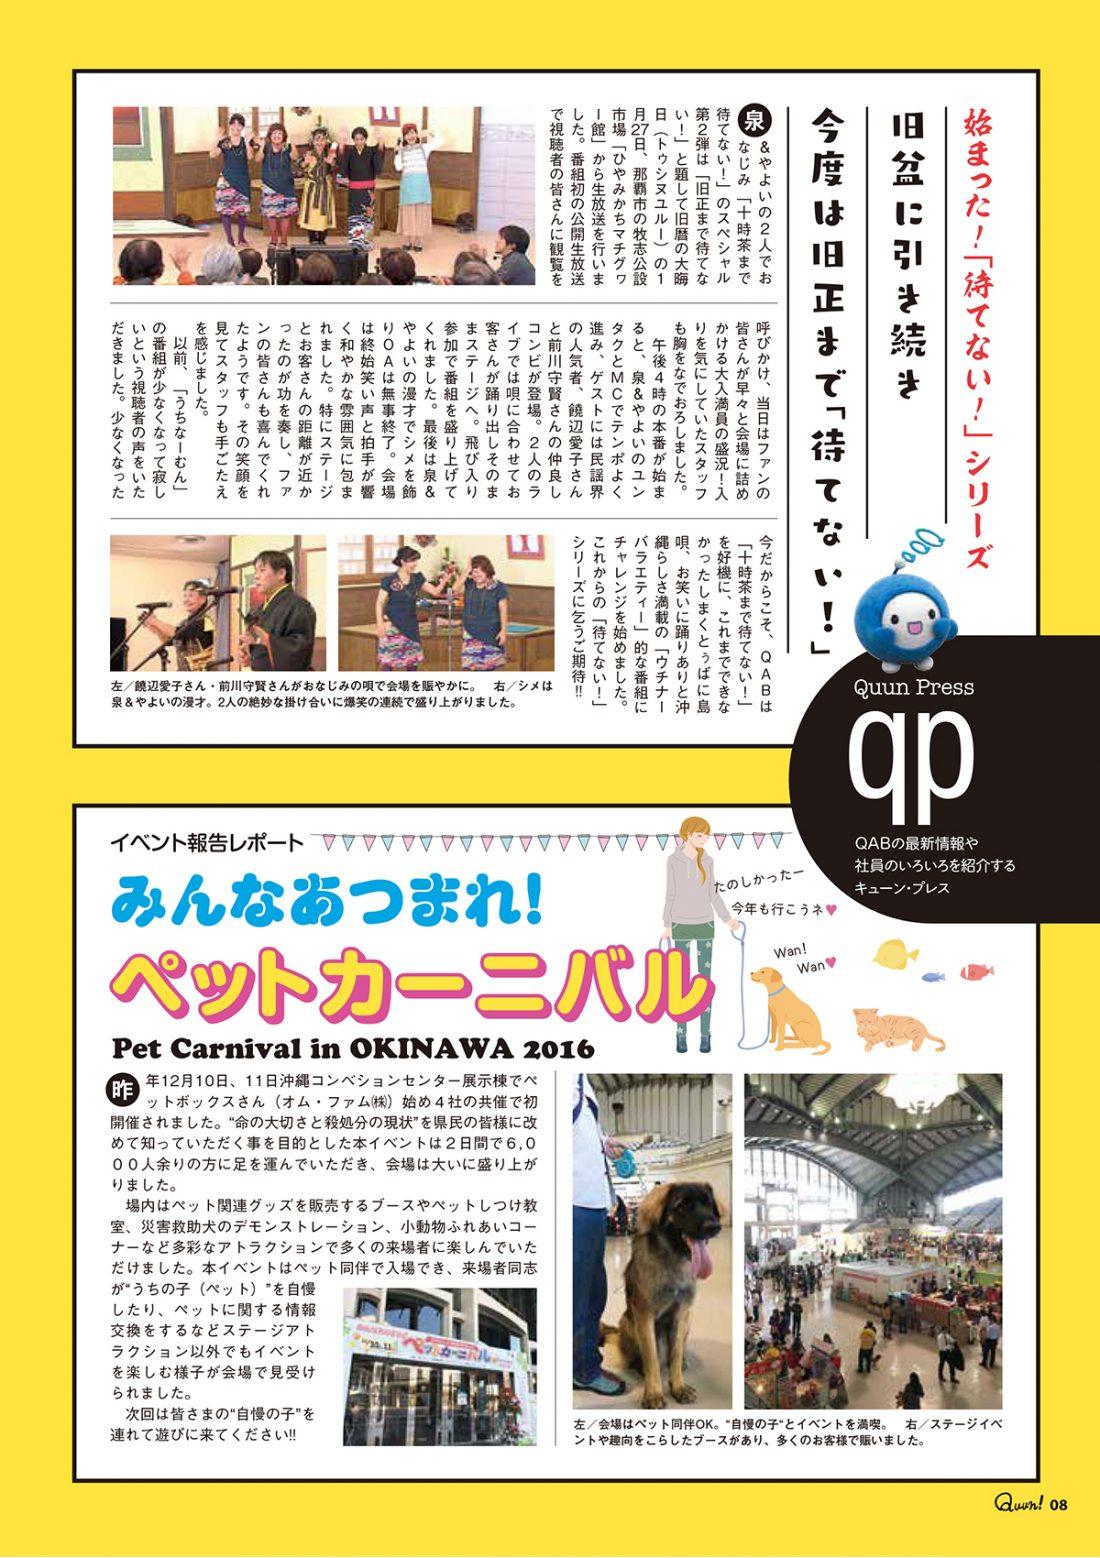 http://www.qab.co.jp/qgoro/wp-content/uploads/quun_0710-1100x1558.jpg